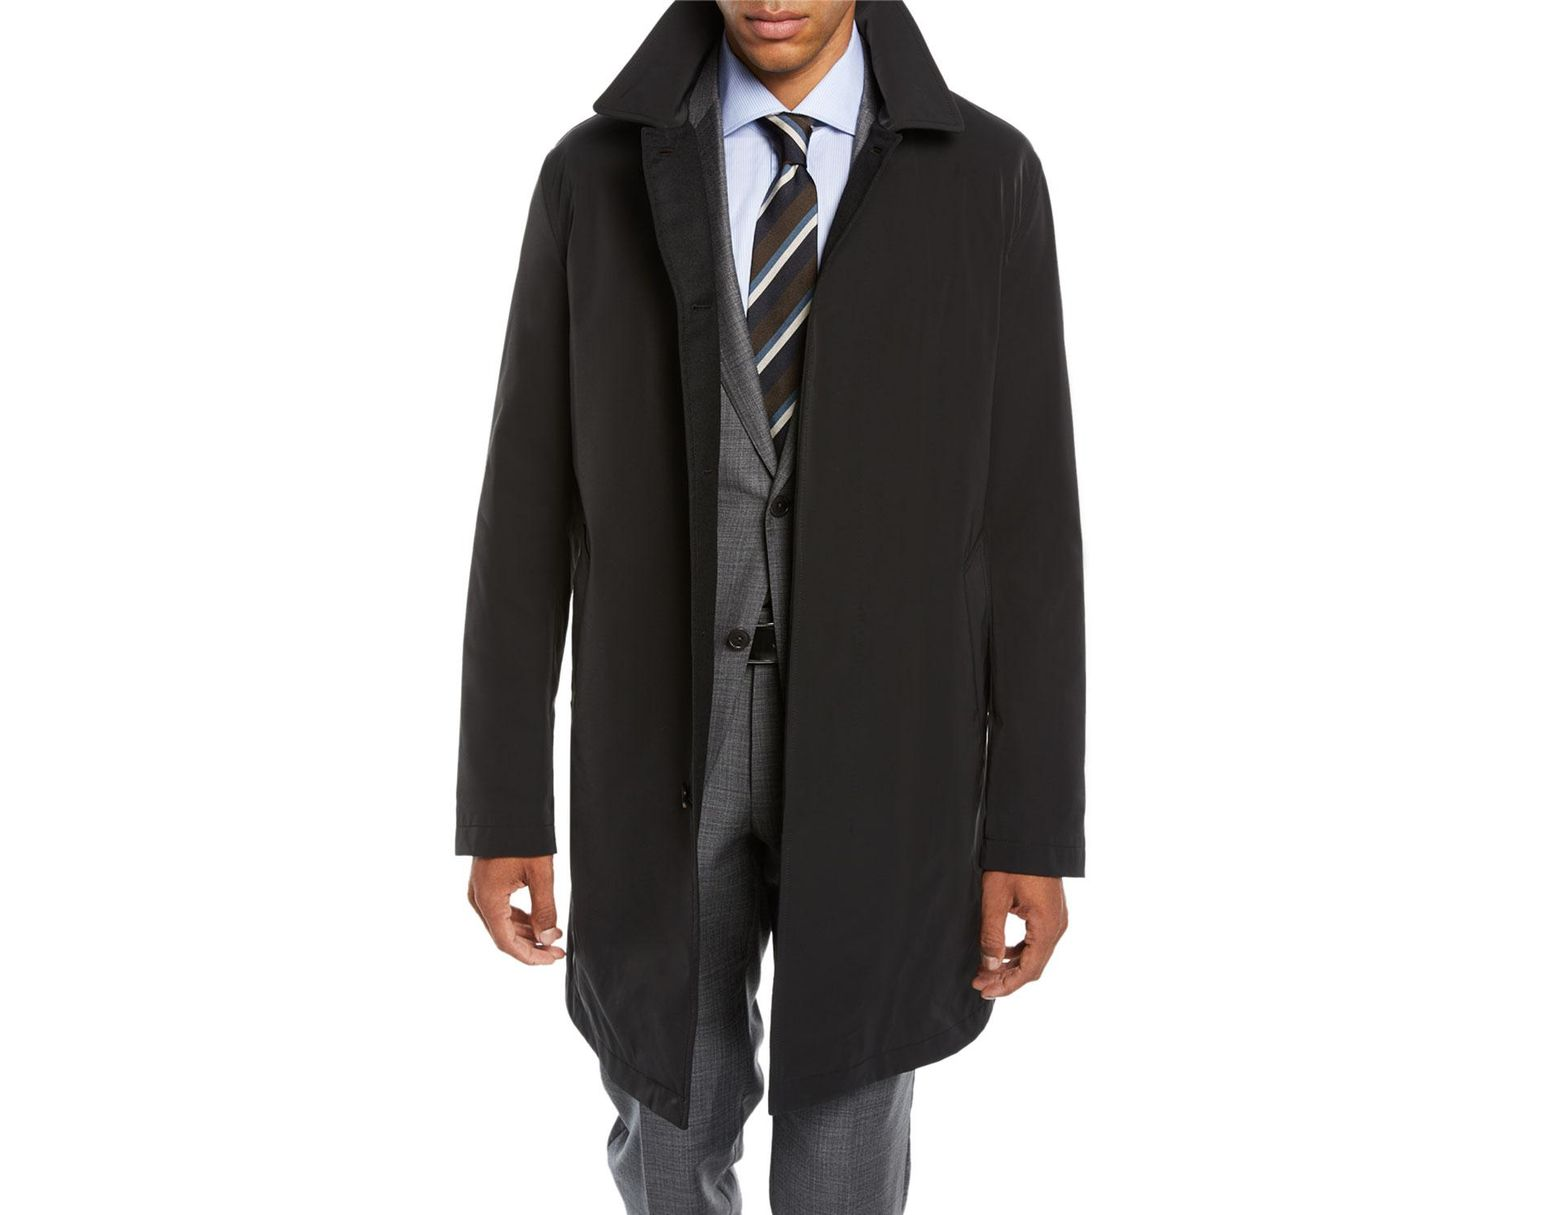 36f55813 Ermenegildo Zegna Men's Reversible Car Coat in Black for Men - Lyst